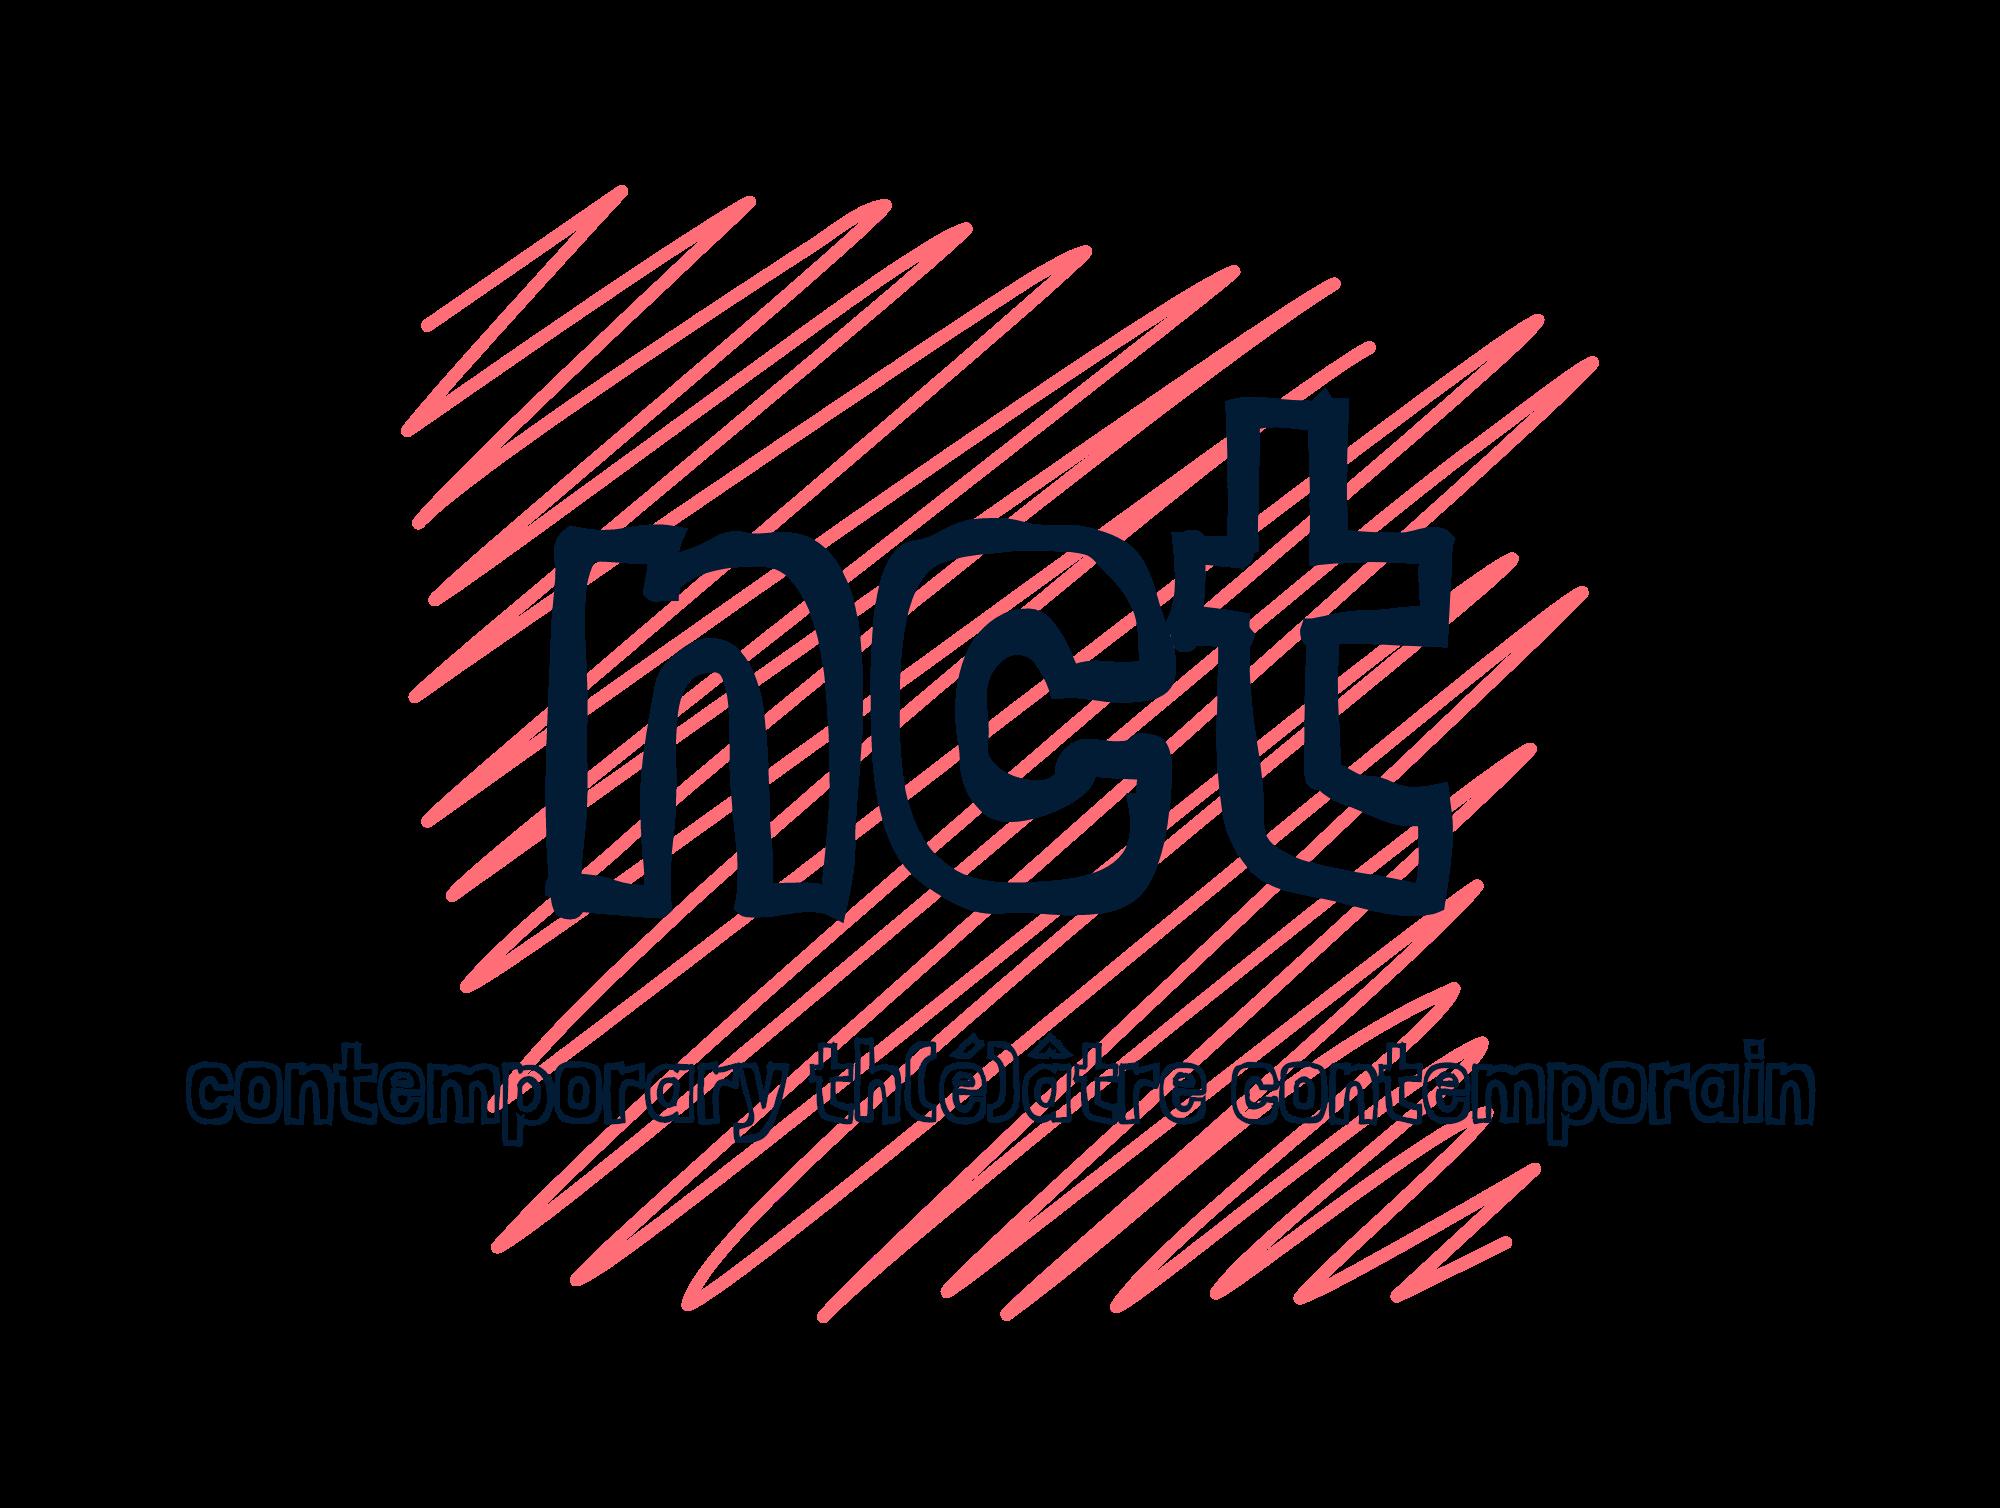 nct-logo (8).jpg